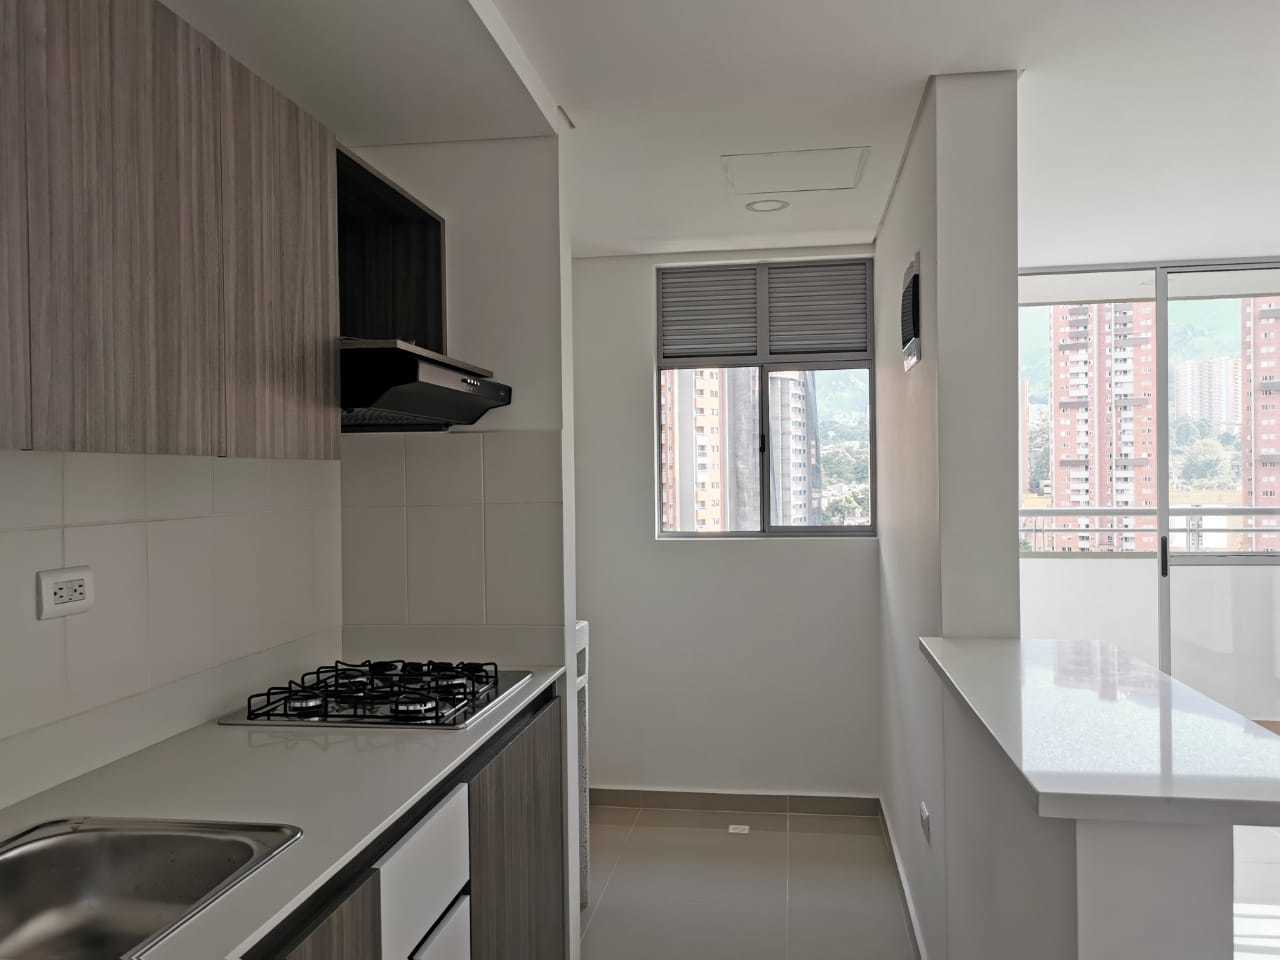 100025 - Apartamento En venta  - Itagui - Antioquia